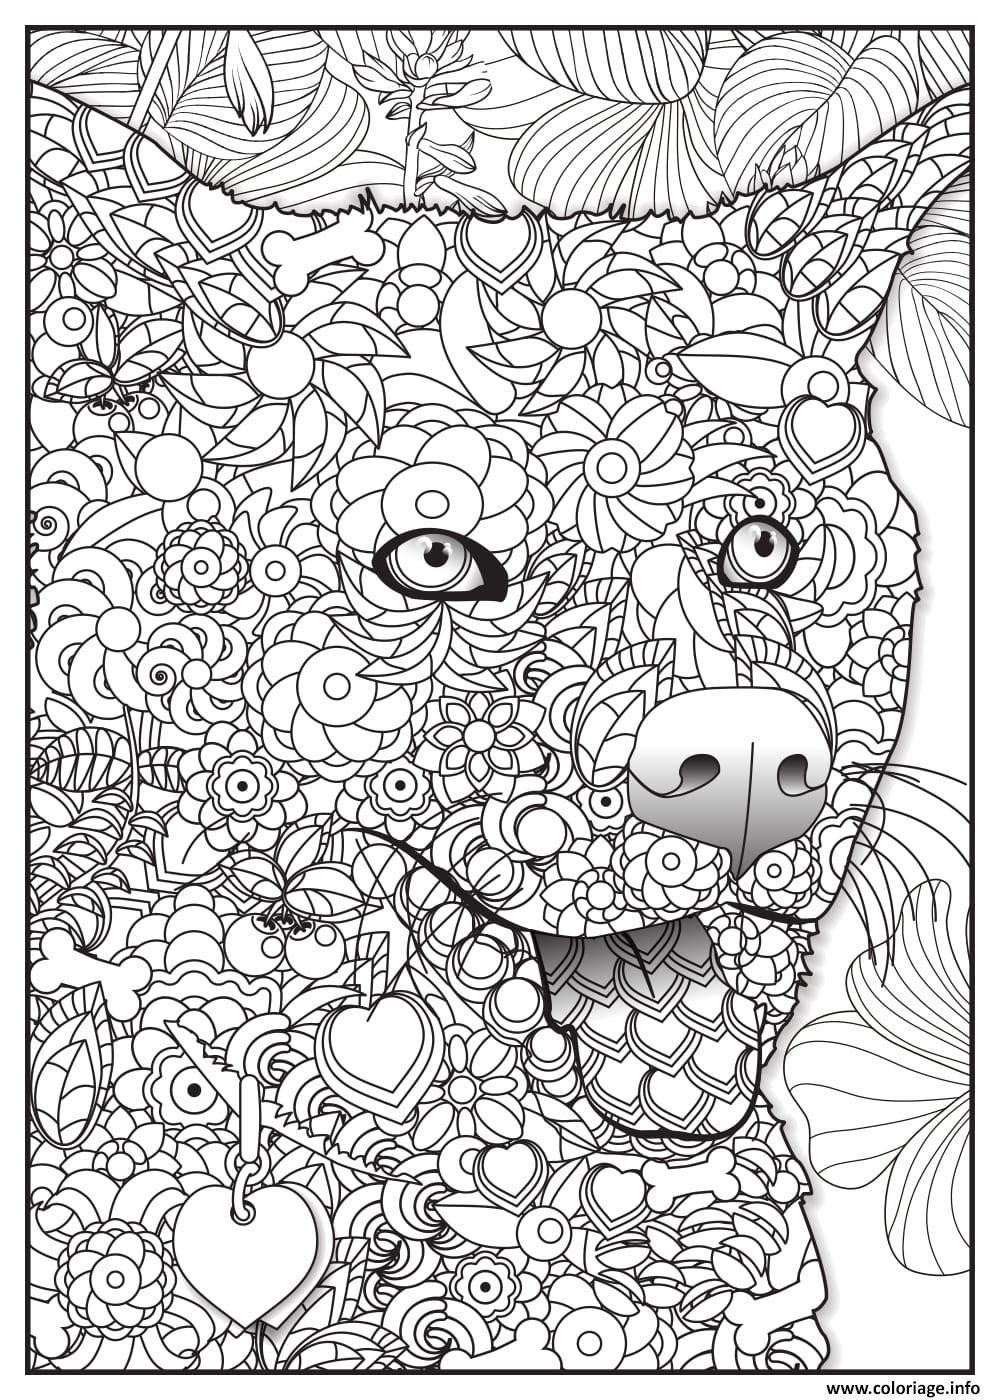 Coloriage Renard Fox Adulte Animaux Dessin Adulte Animaux A Imprimer